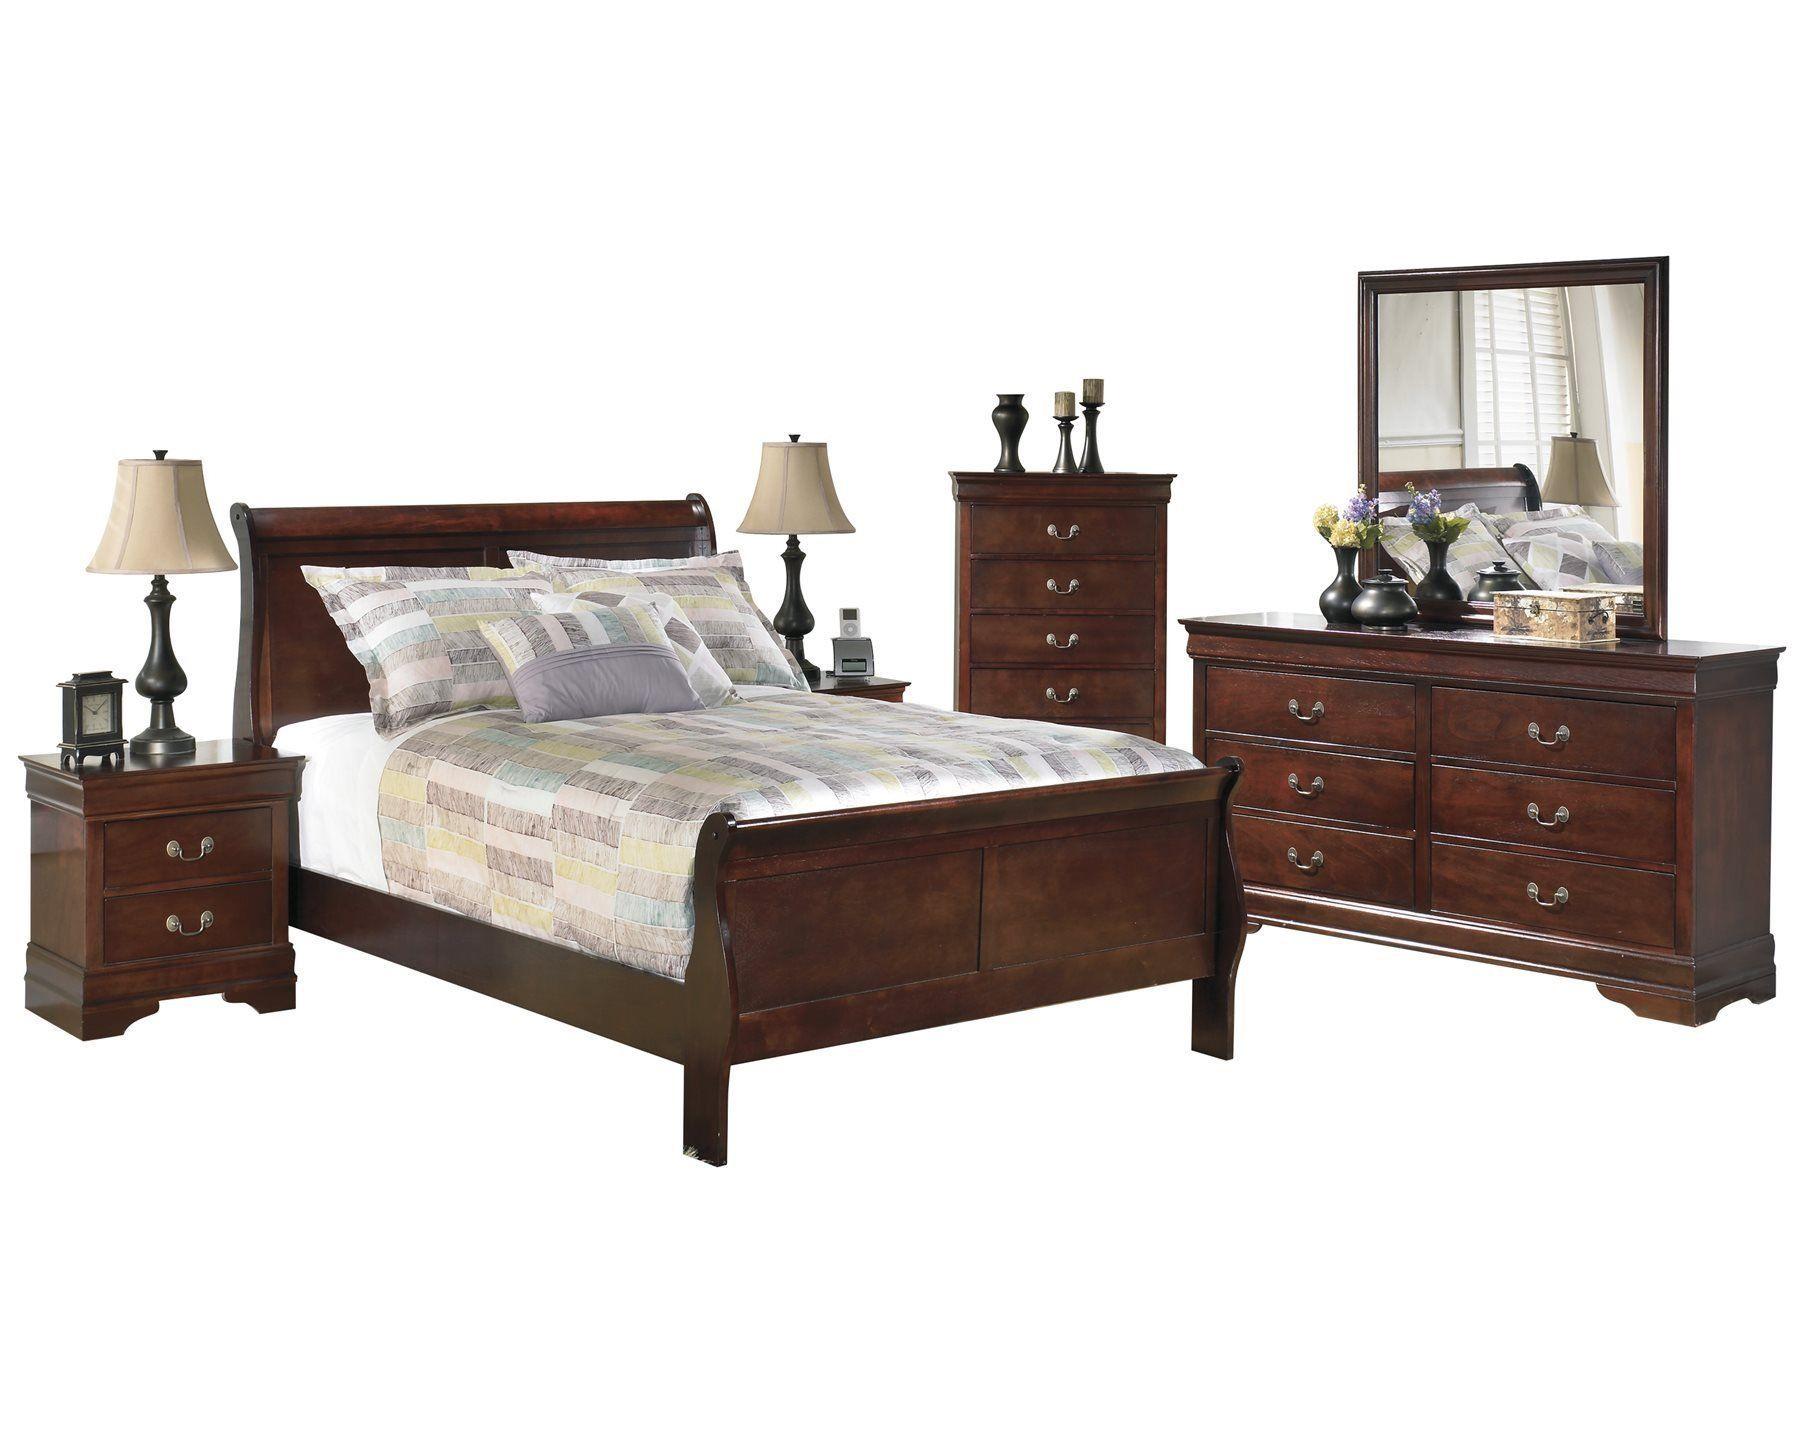 Ashley Alisdair 6PC Bedroom Set Full Sleigh Bed Two